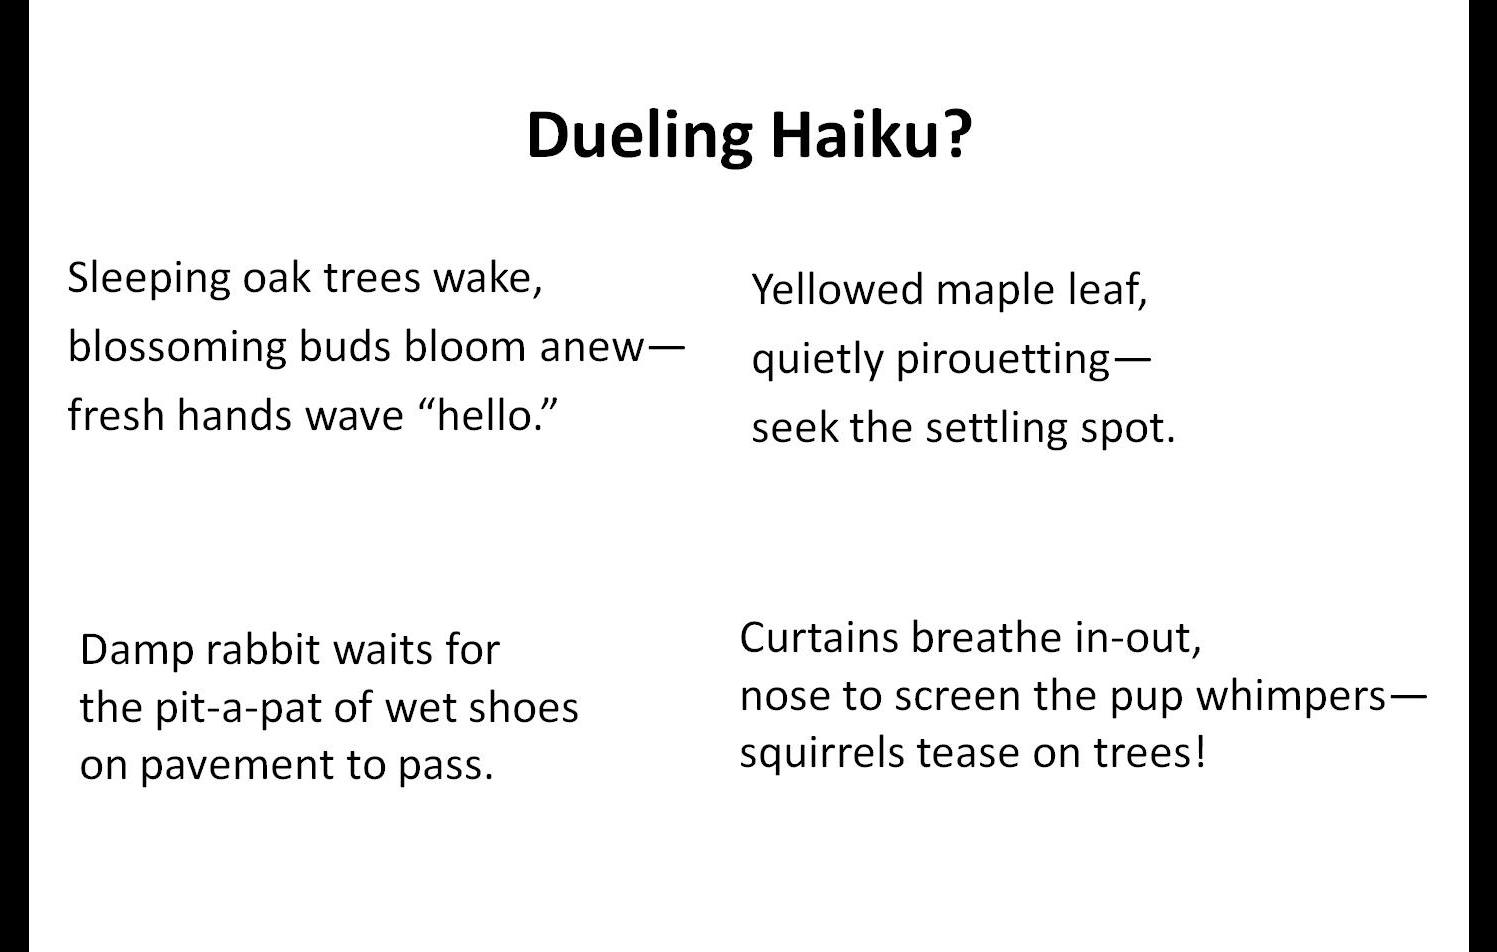 Worksheet Haiku Worksheet Grass Fedjp Worksheet Study Site